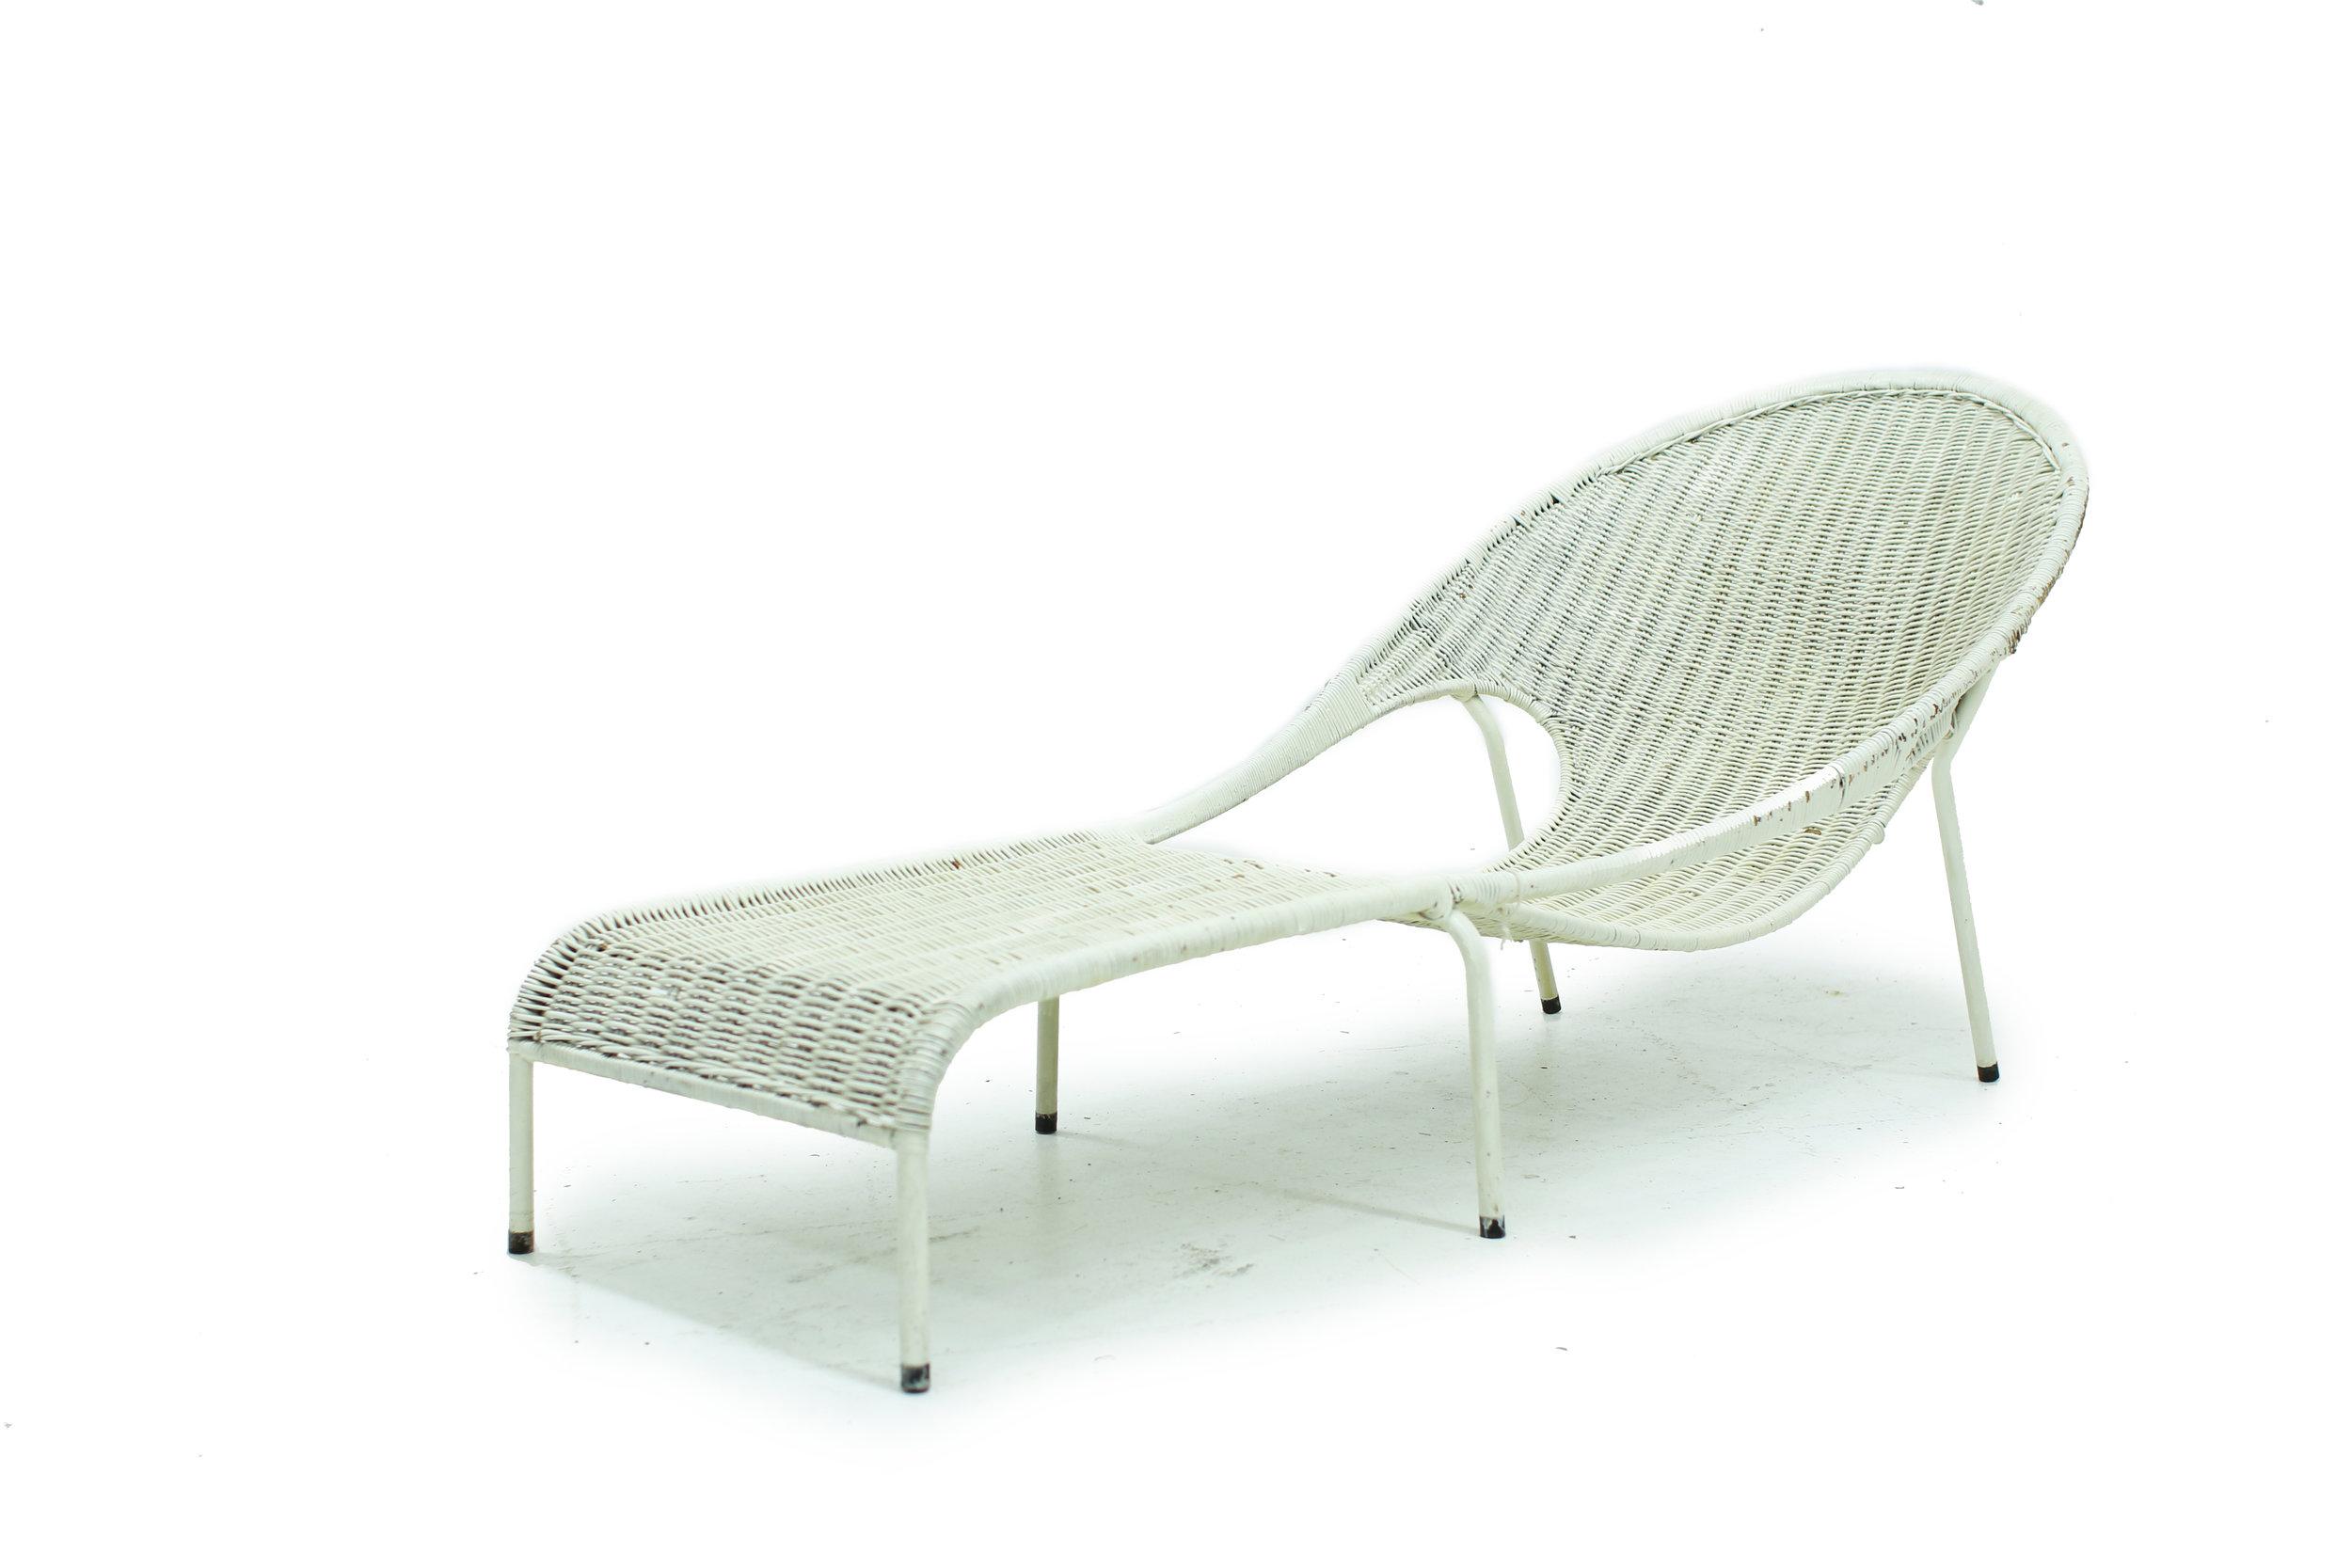 Vintage White Wicker Lounge Chair (1).jpg